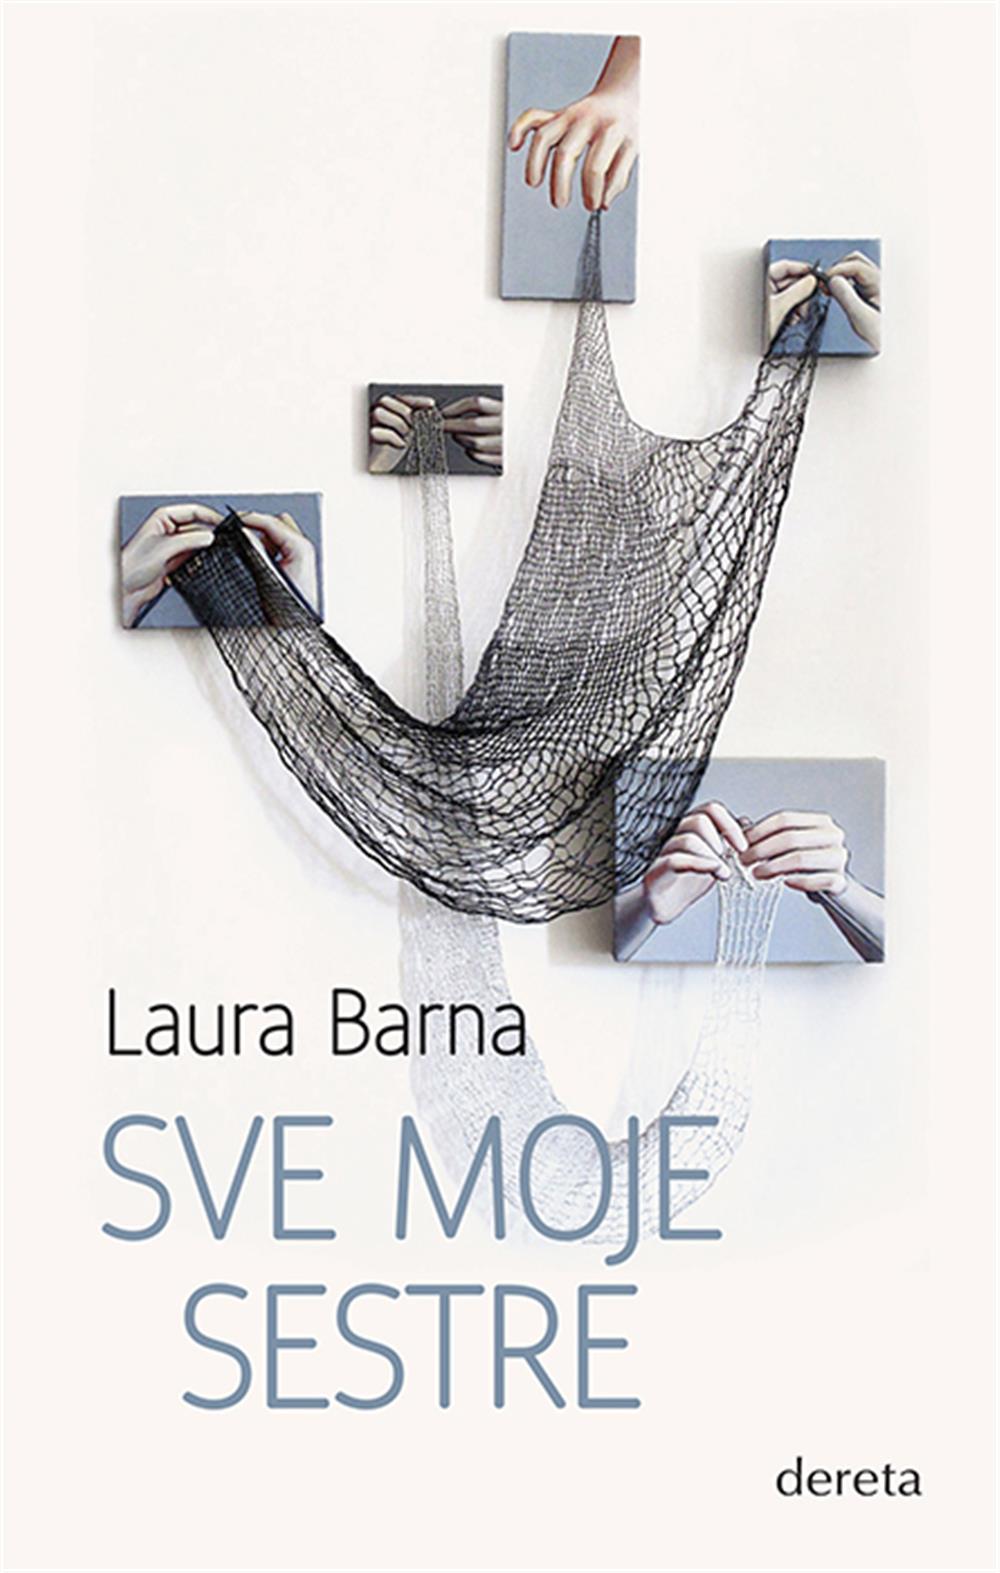 Knjiga Laure Barne Sve moje sestre